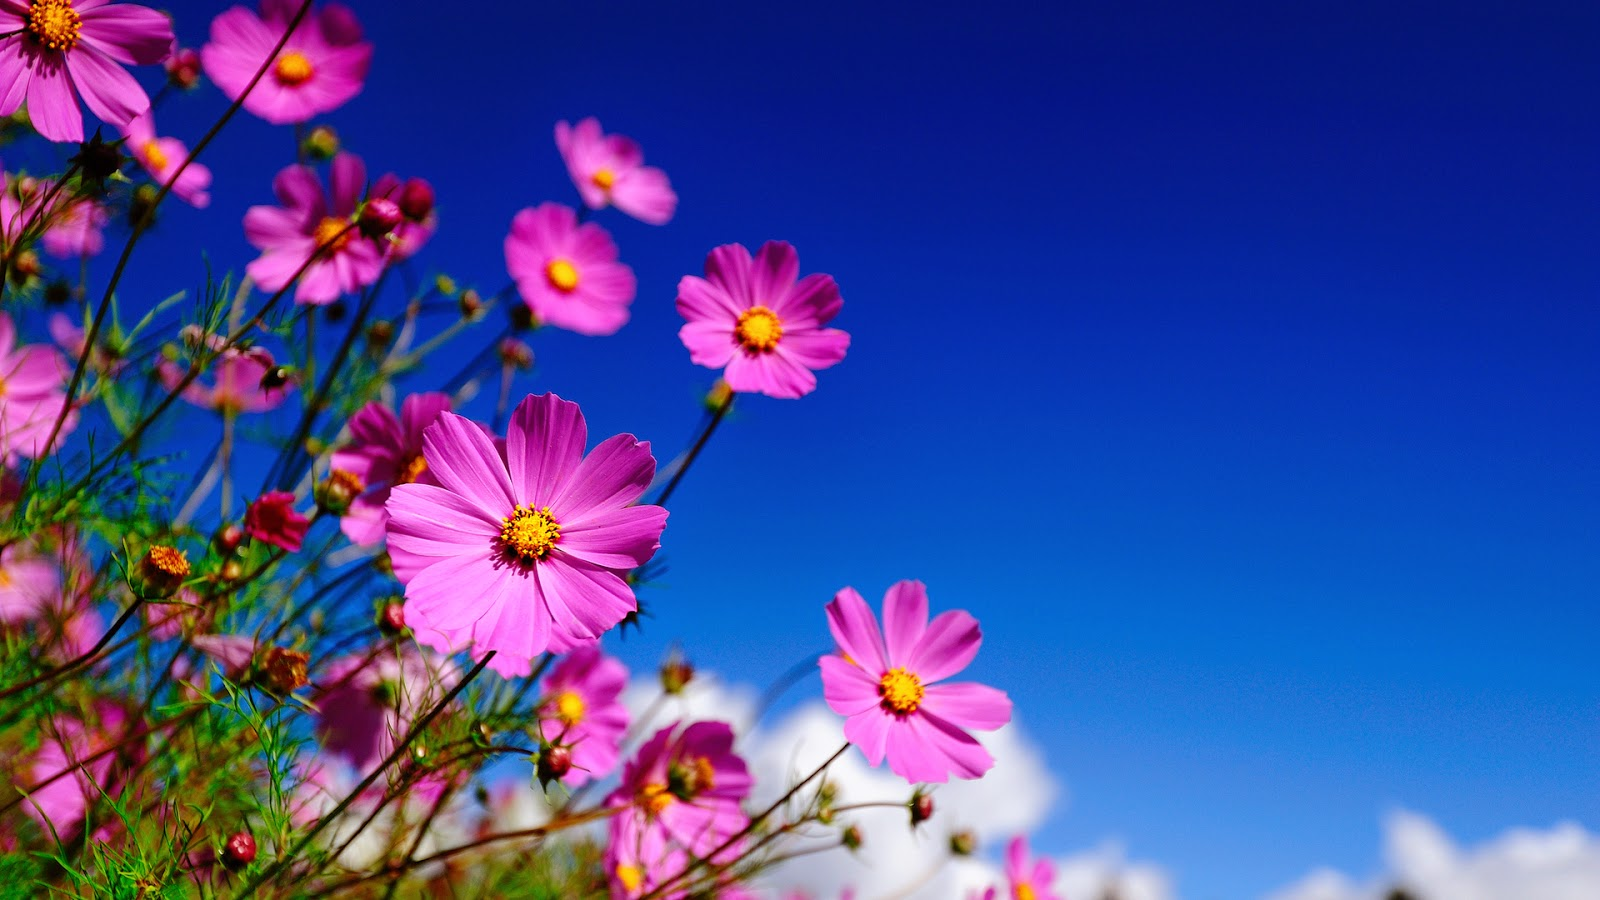 Nice Flowers Wallpaper Desktop Background Full Screen anaknulp 1600x900